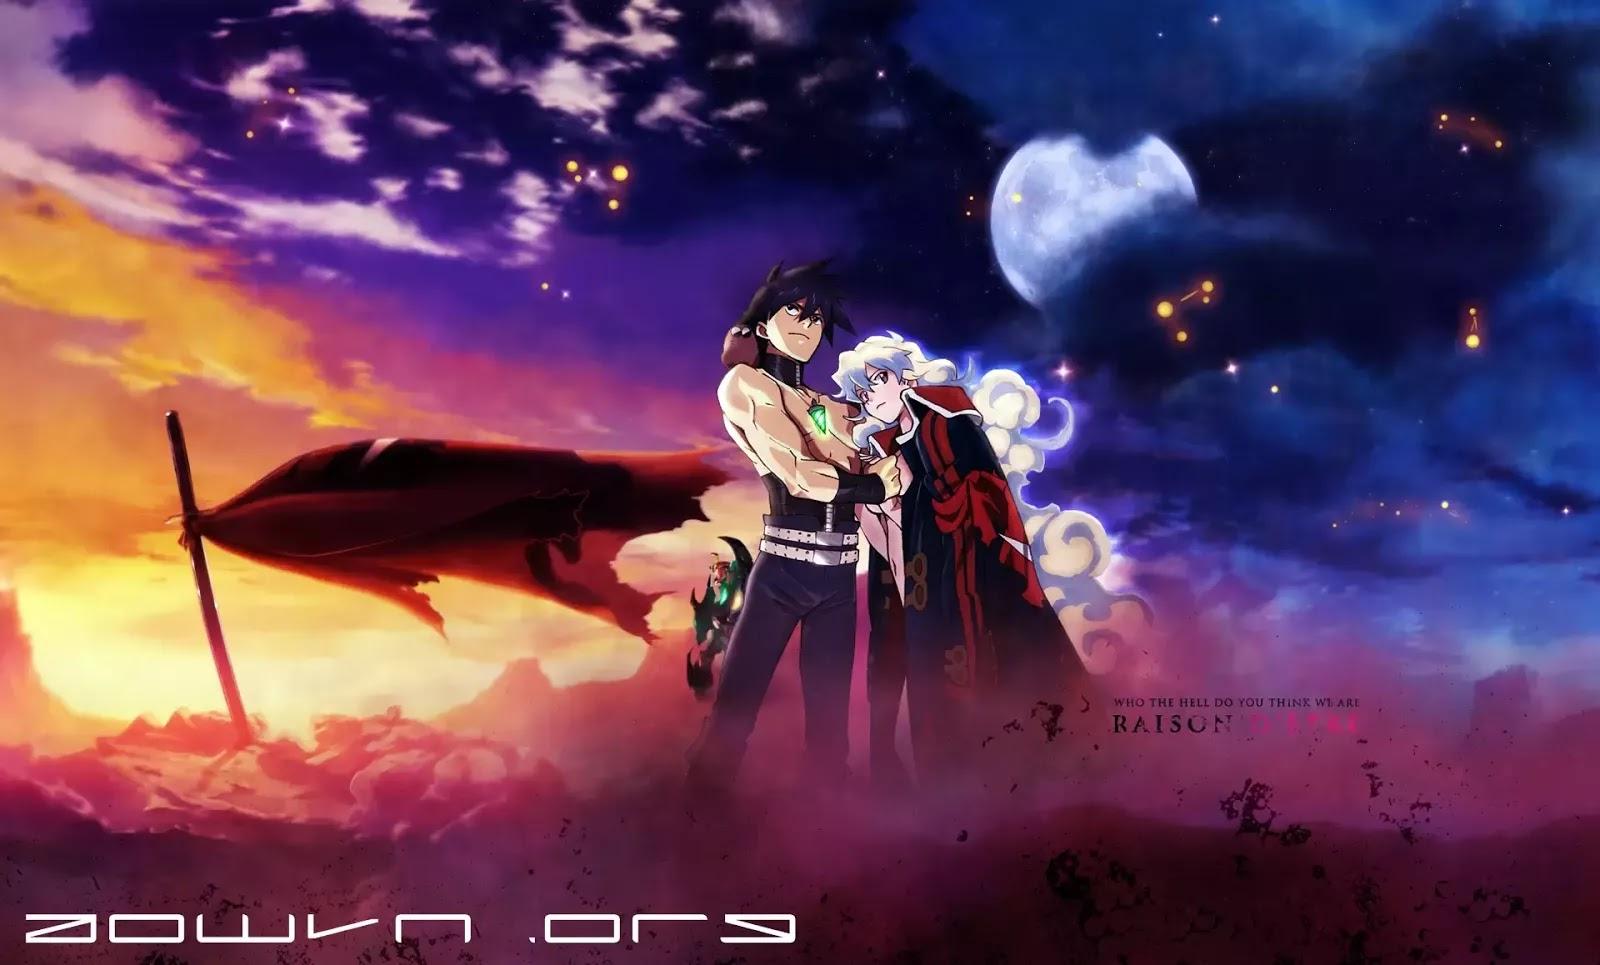 tengen4 AowVN.org m - [ Anime 3gp Mp4 ] Tengen Toppa Gurren Lagann + Movie | Vietsub - Mecha hấp dẫn